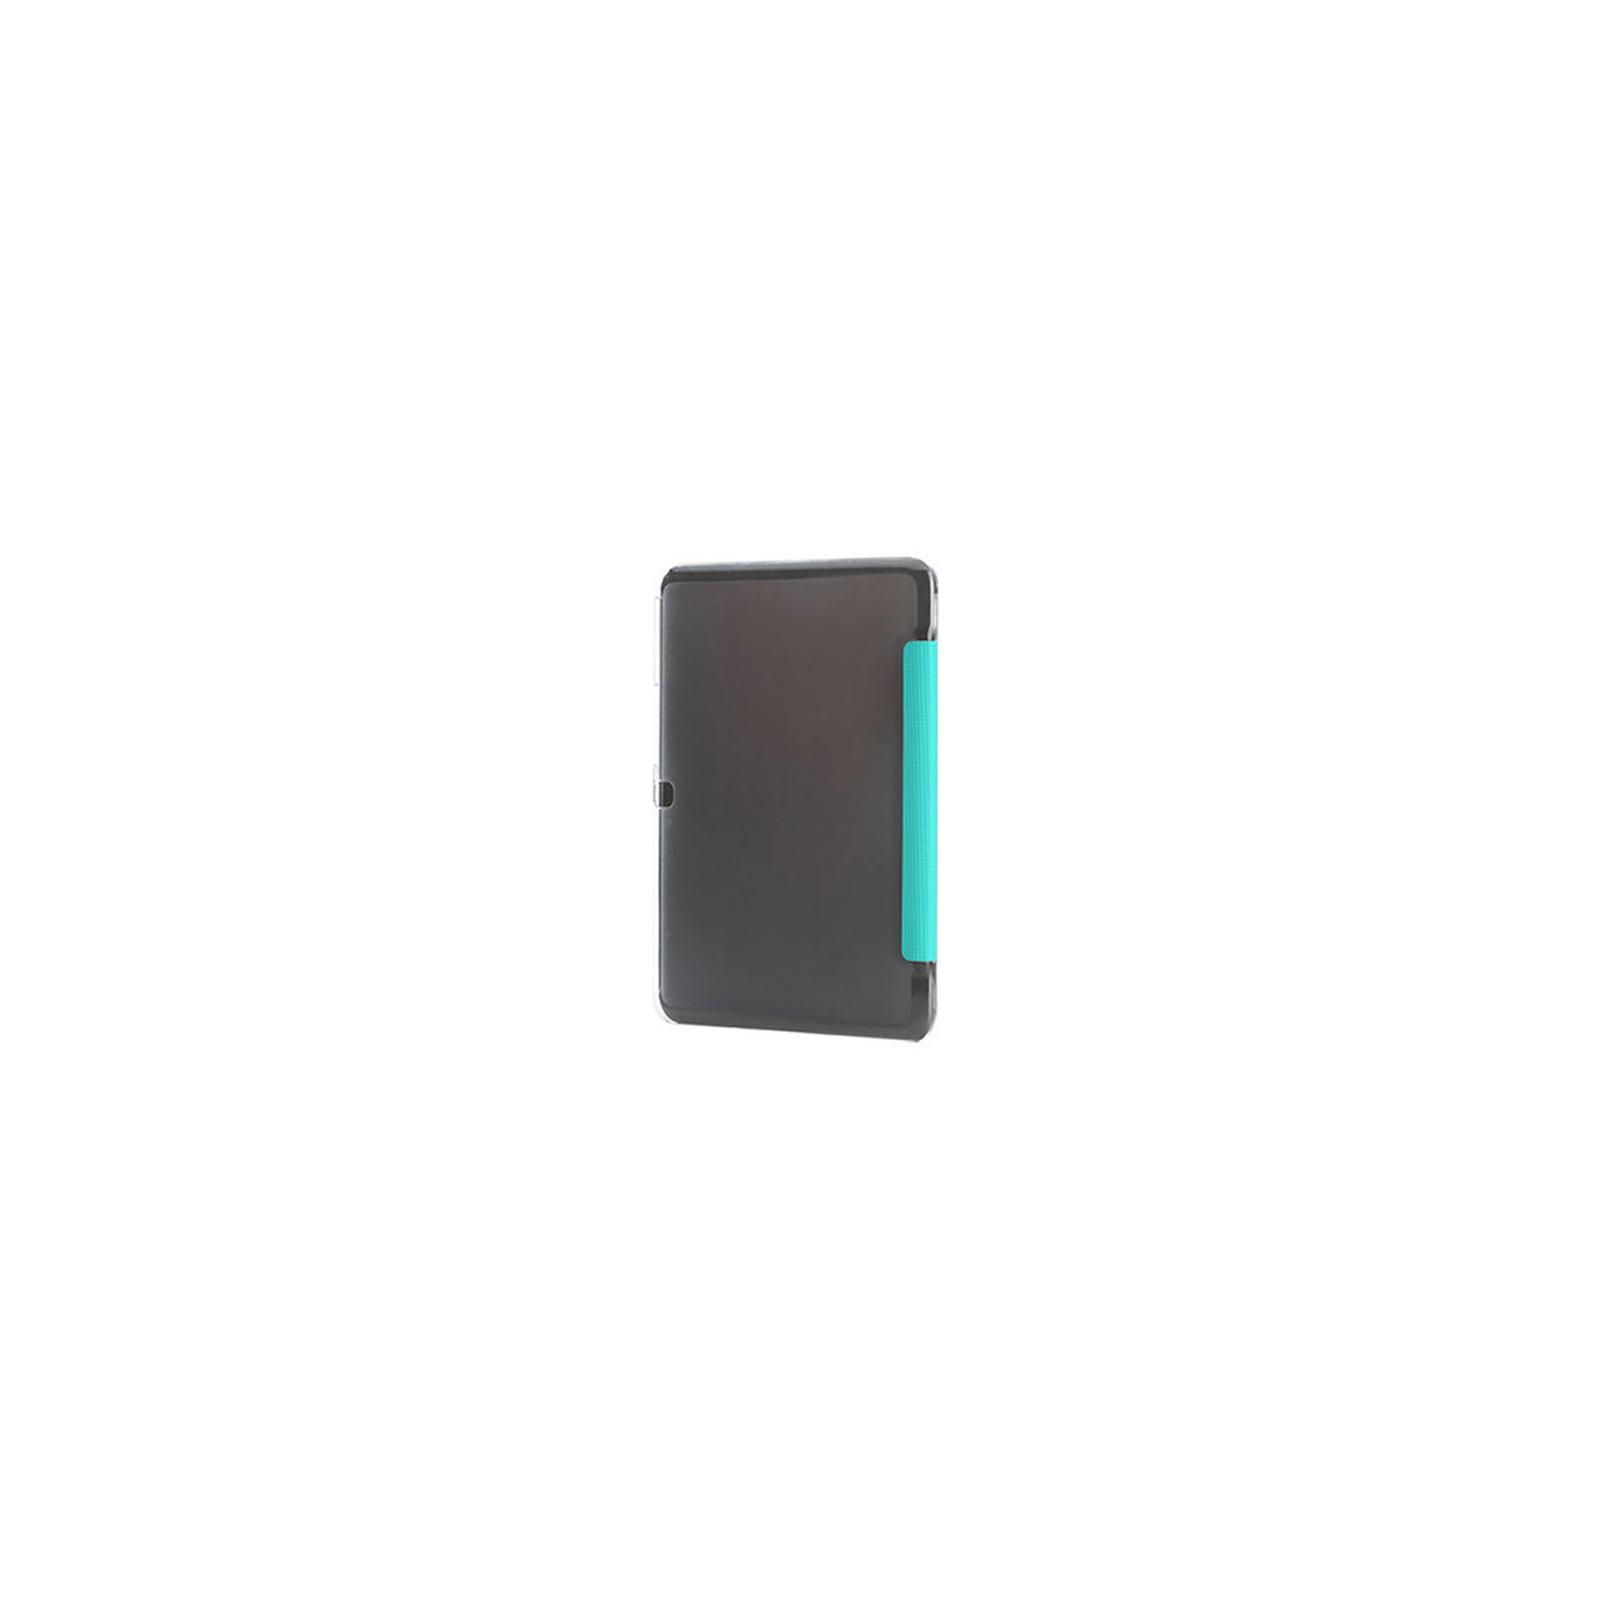 Чехол для планшета Rock Samsung Galaxy Tab 4 10.1 New elegant series azure (Tab 4 10.1-65462) изображение 2